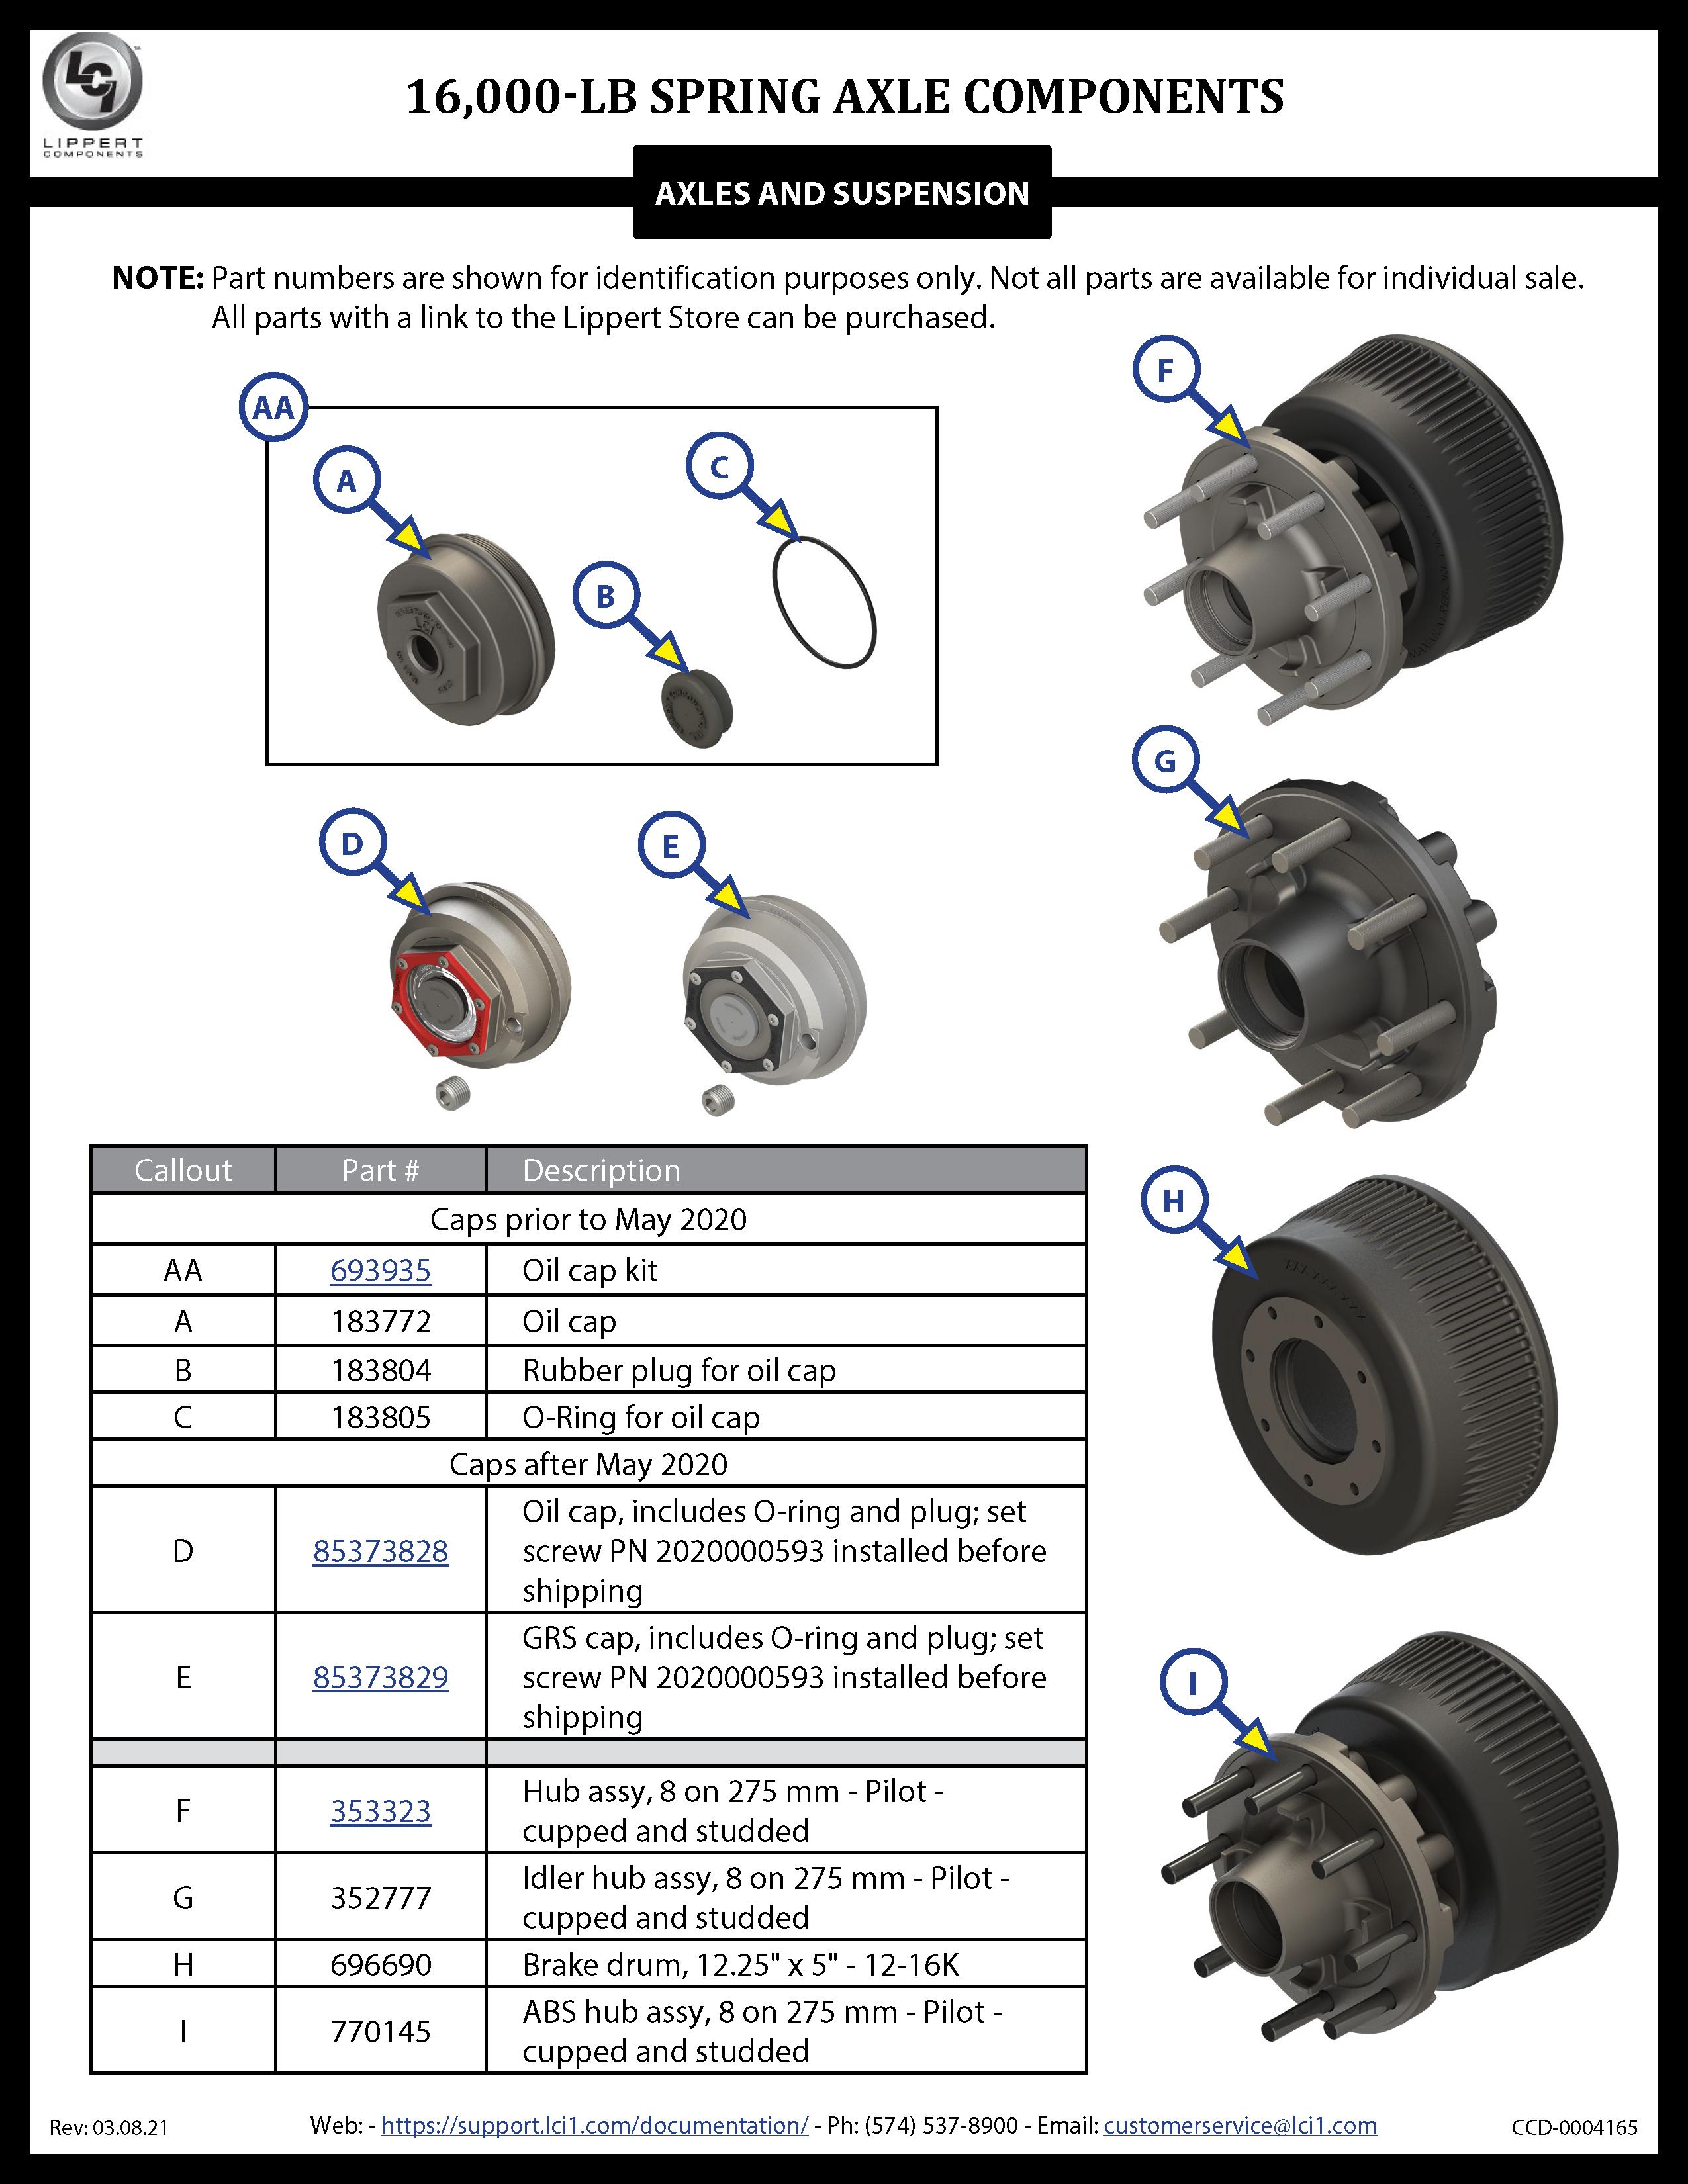 16,000-LB Spring Axle Components